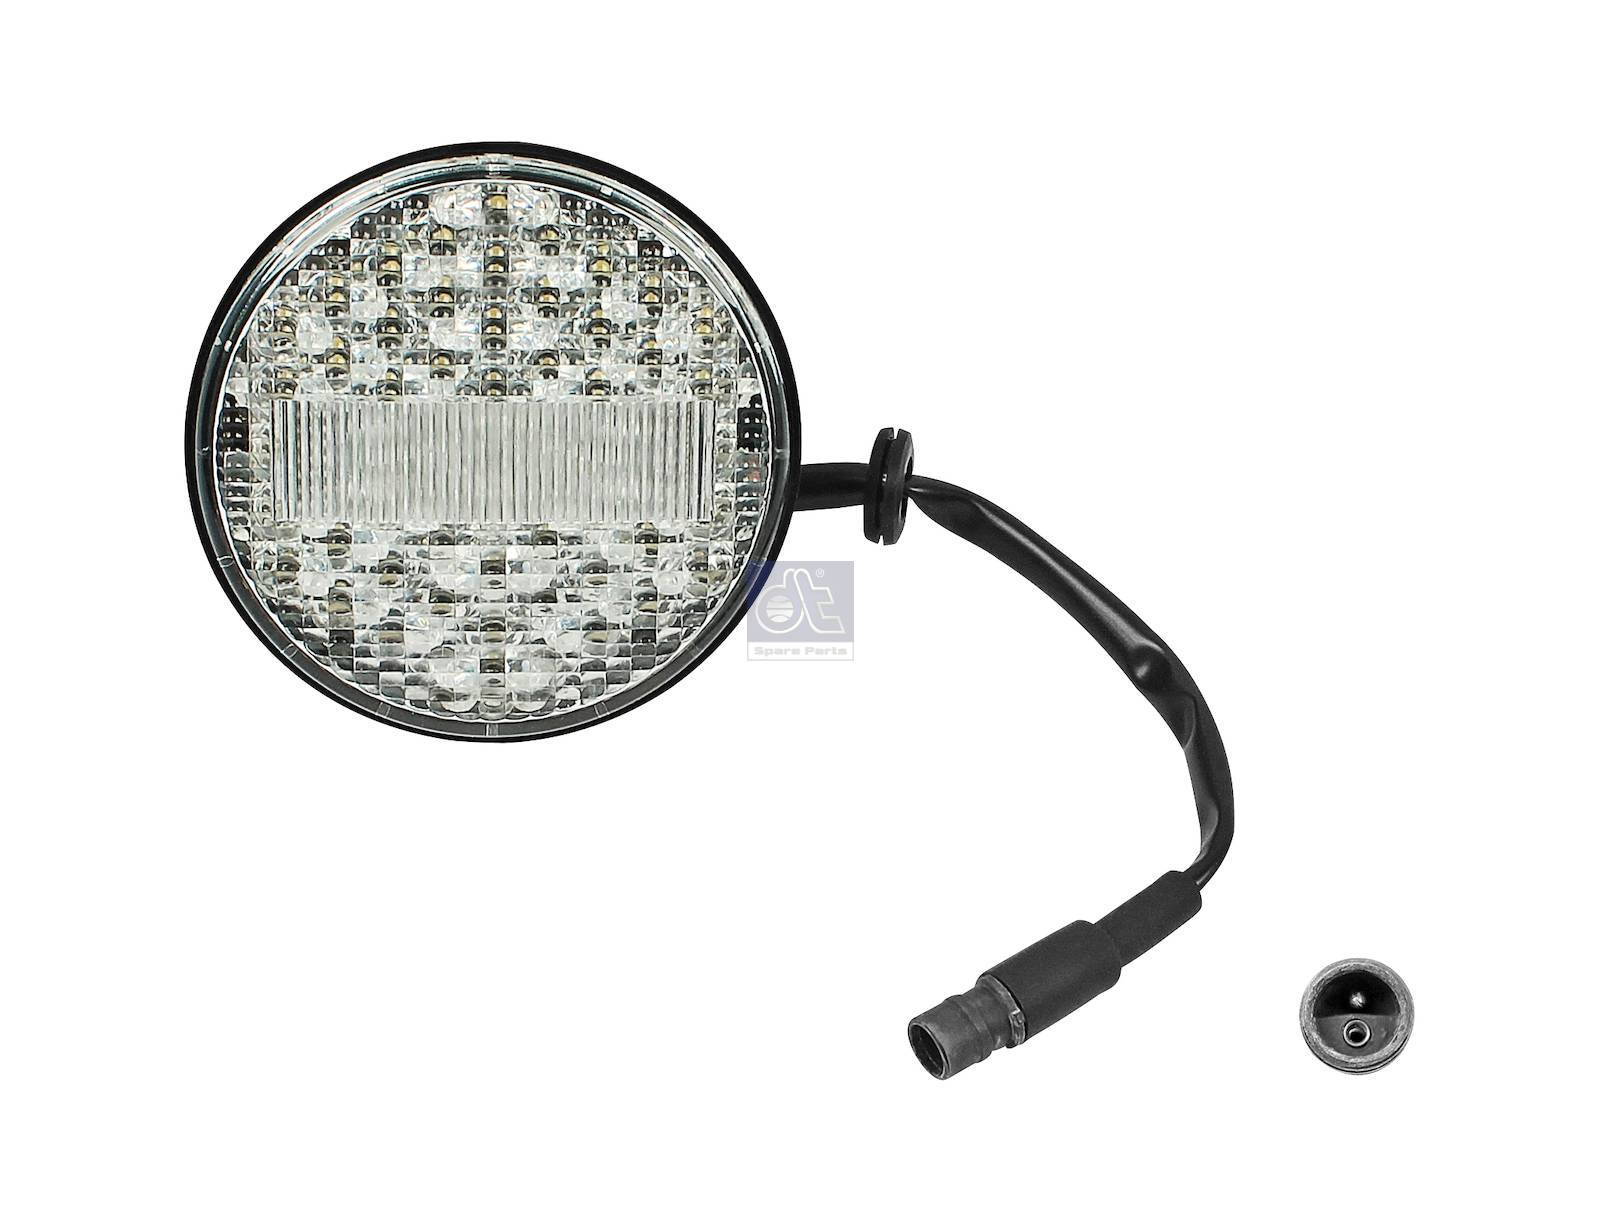 Reverse lamp